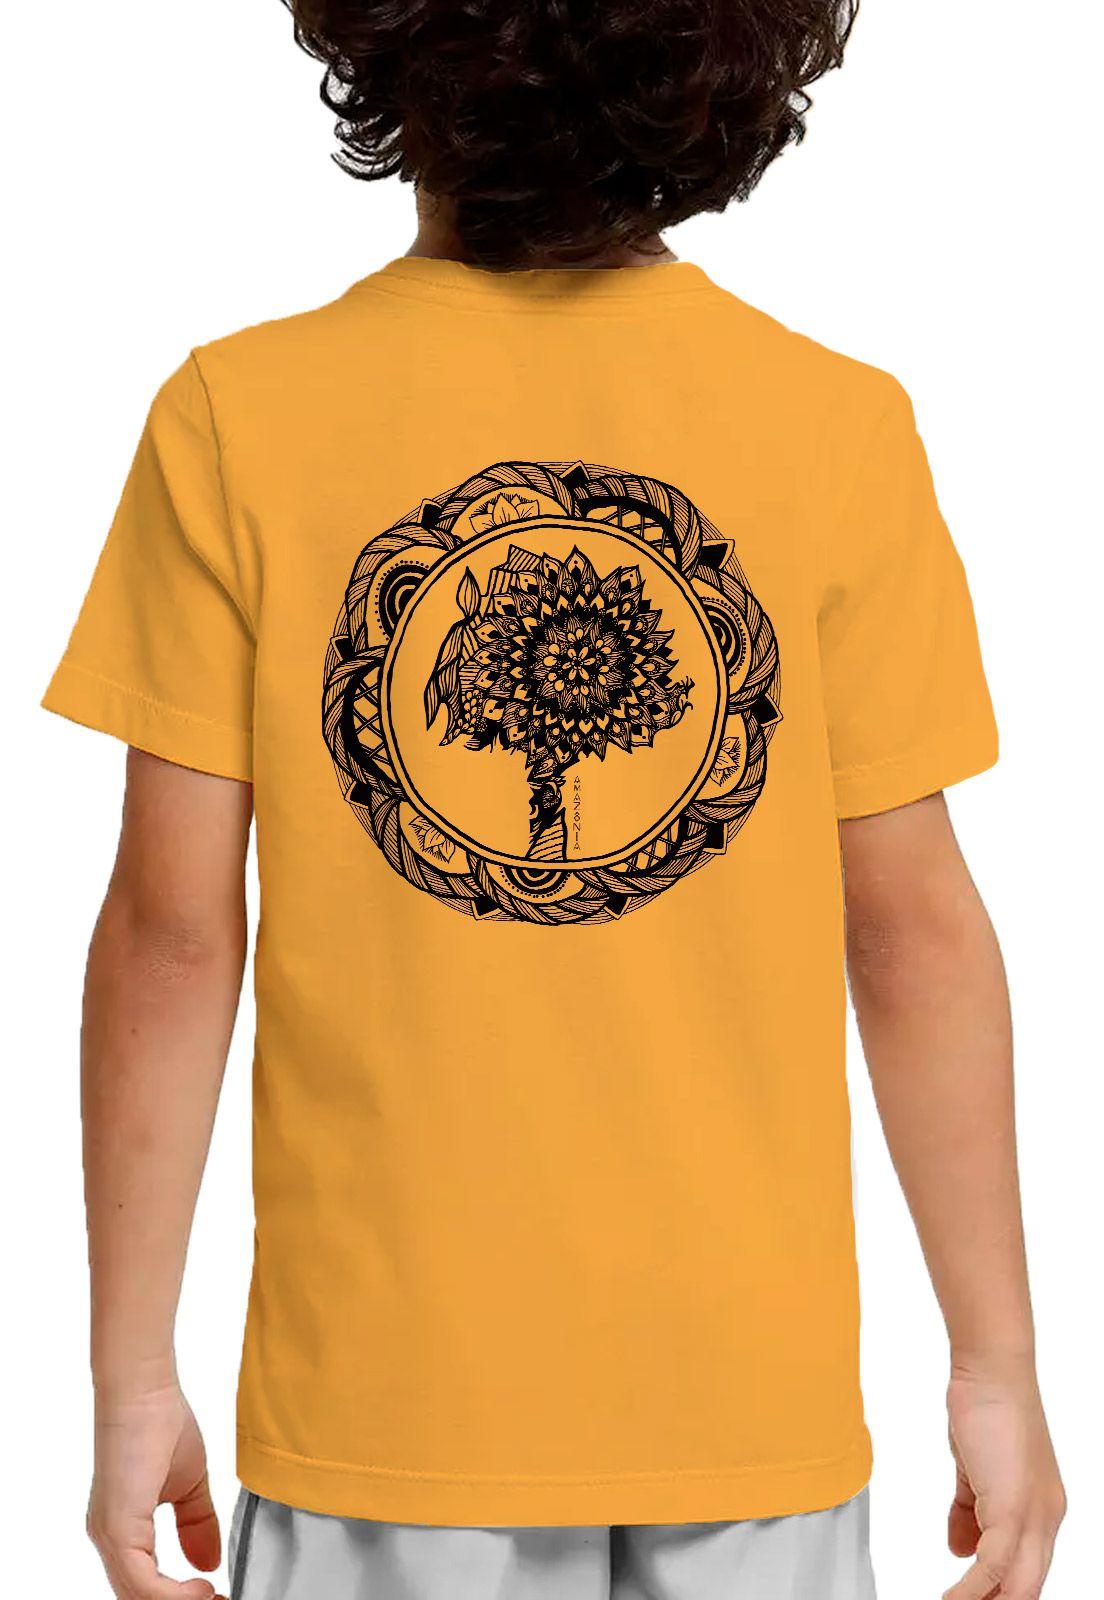 Camiseta Amazônia Adolescente Colagem Logo - Amarelo Escuro